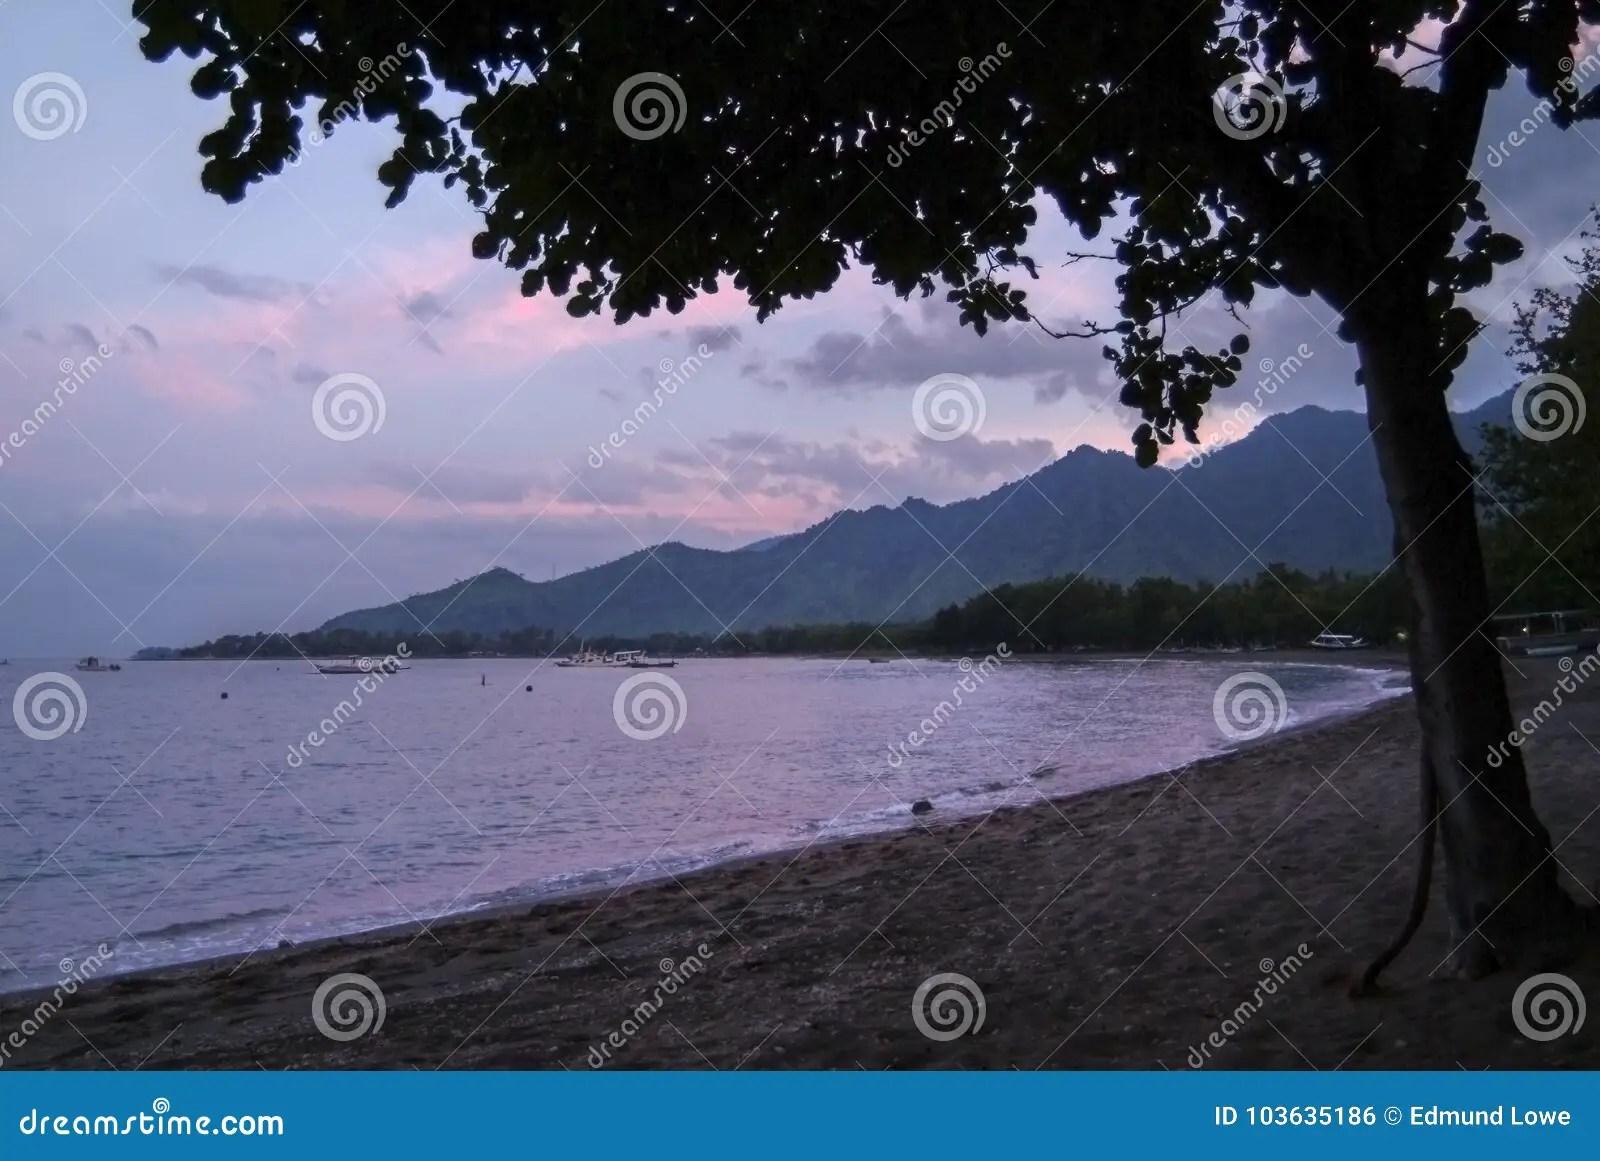 Sunrise On Pemuteran Beach Bali Indonesia Stock Photo